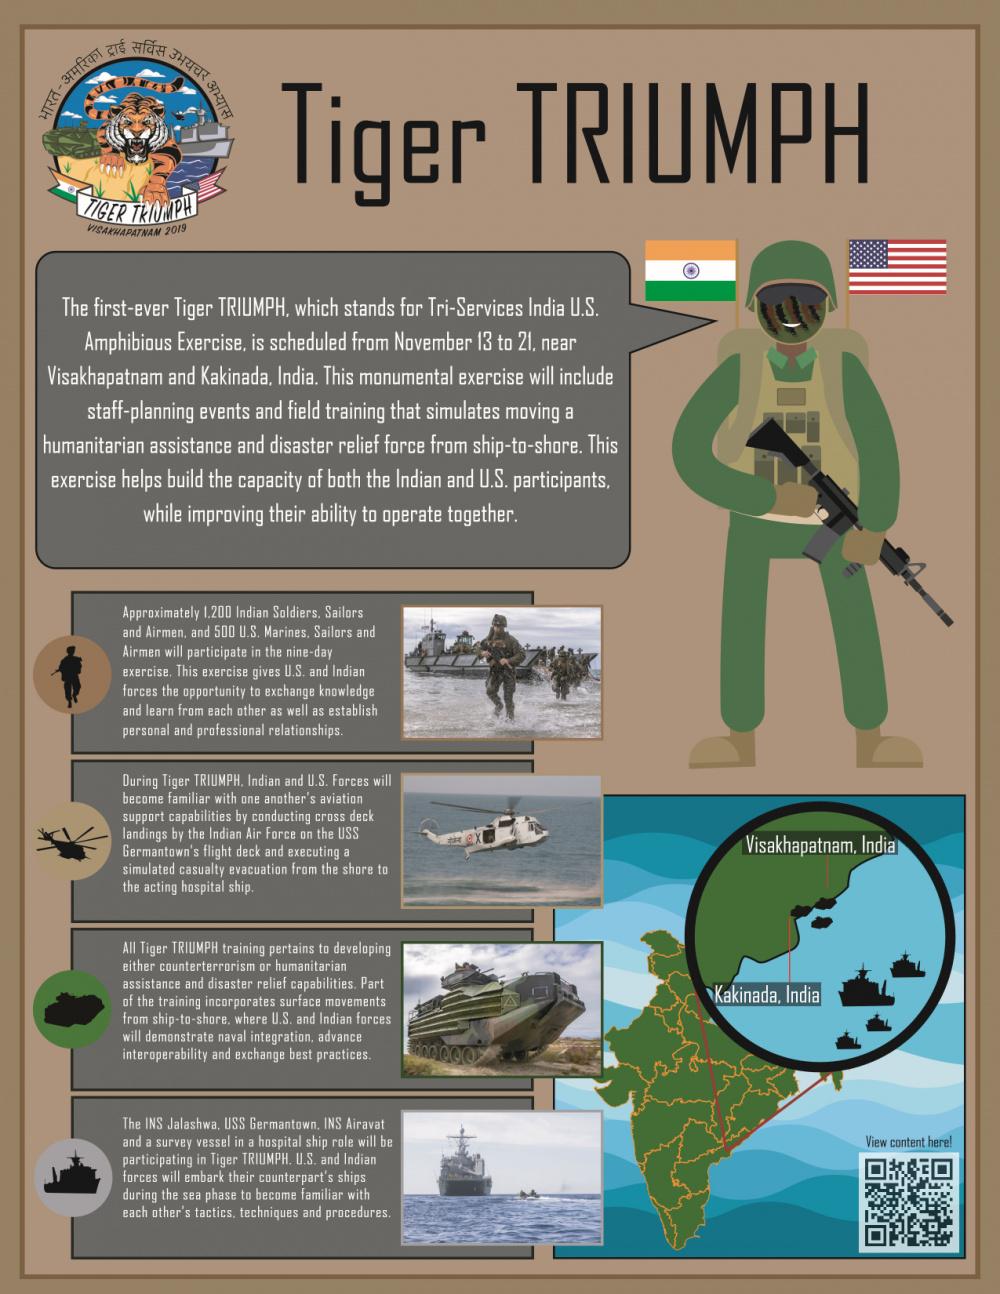 Tiger TRIUMPH Infographic